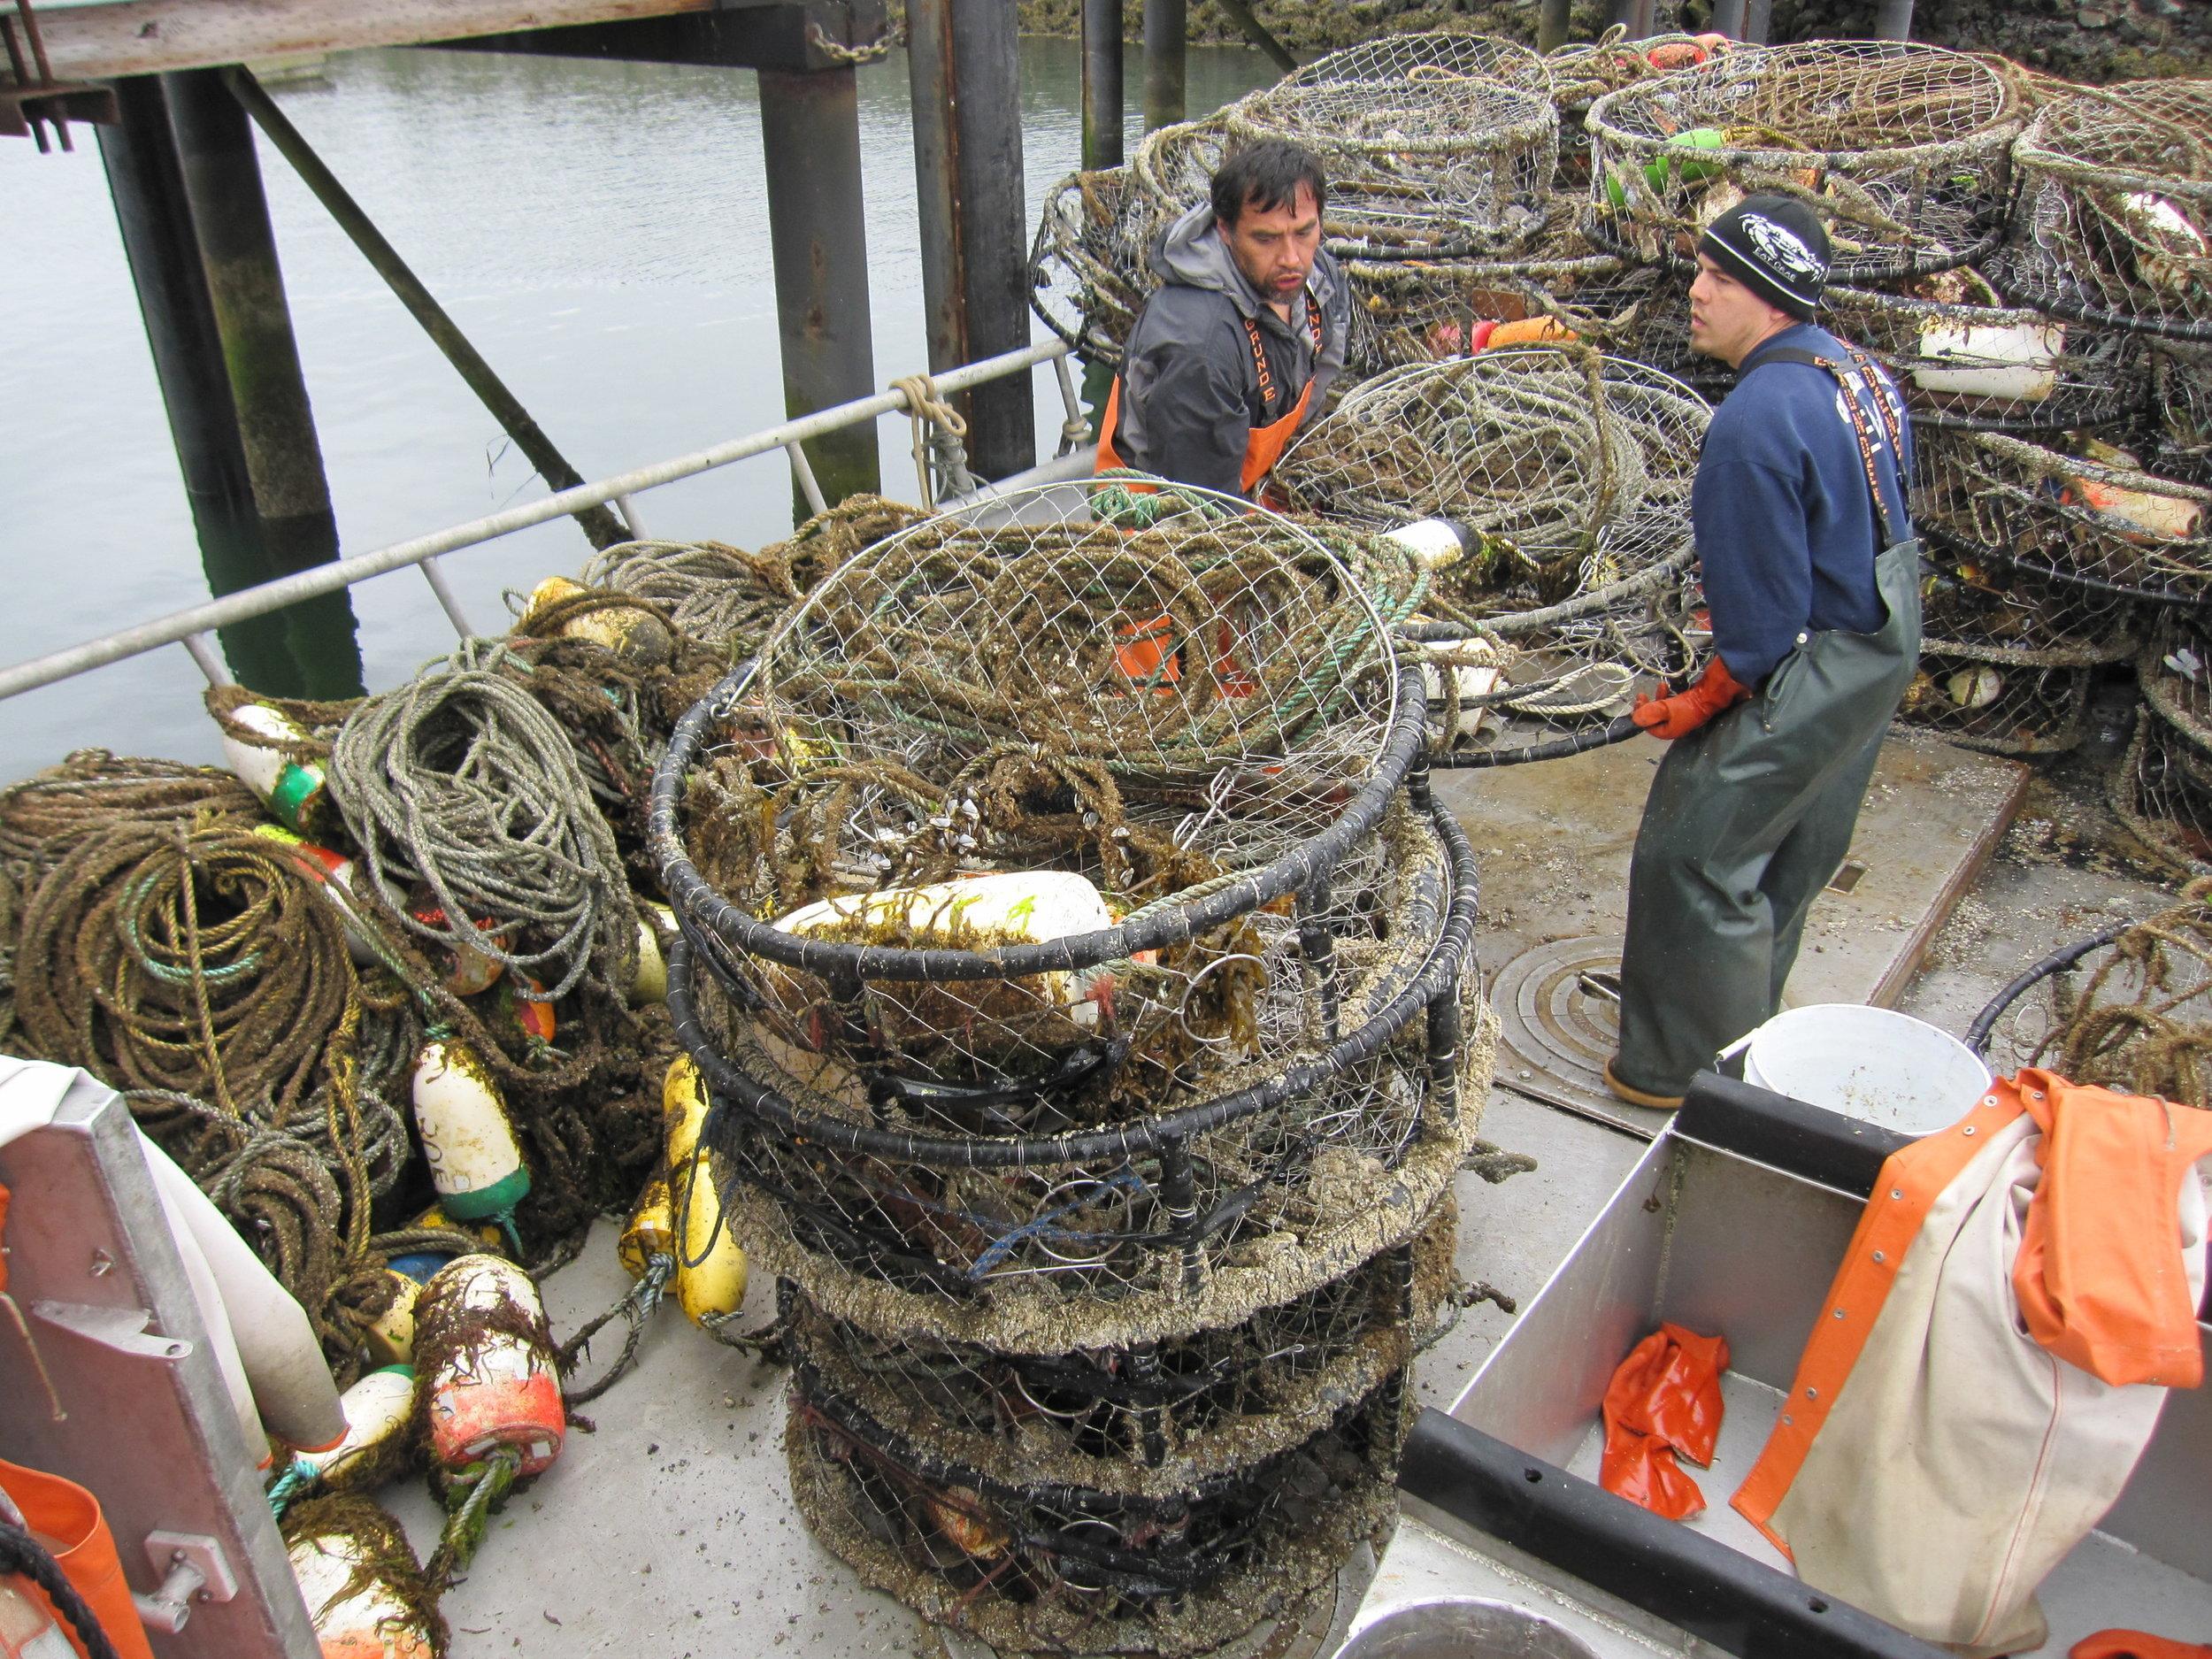 Crab pot retrieval in Grays Harbor County. Photo ©Kyle Antonelis/Natural Resources Consultants